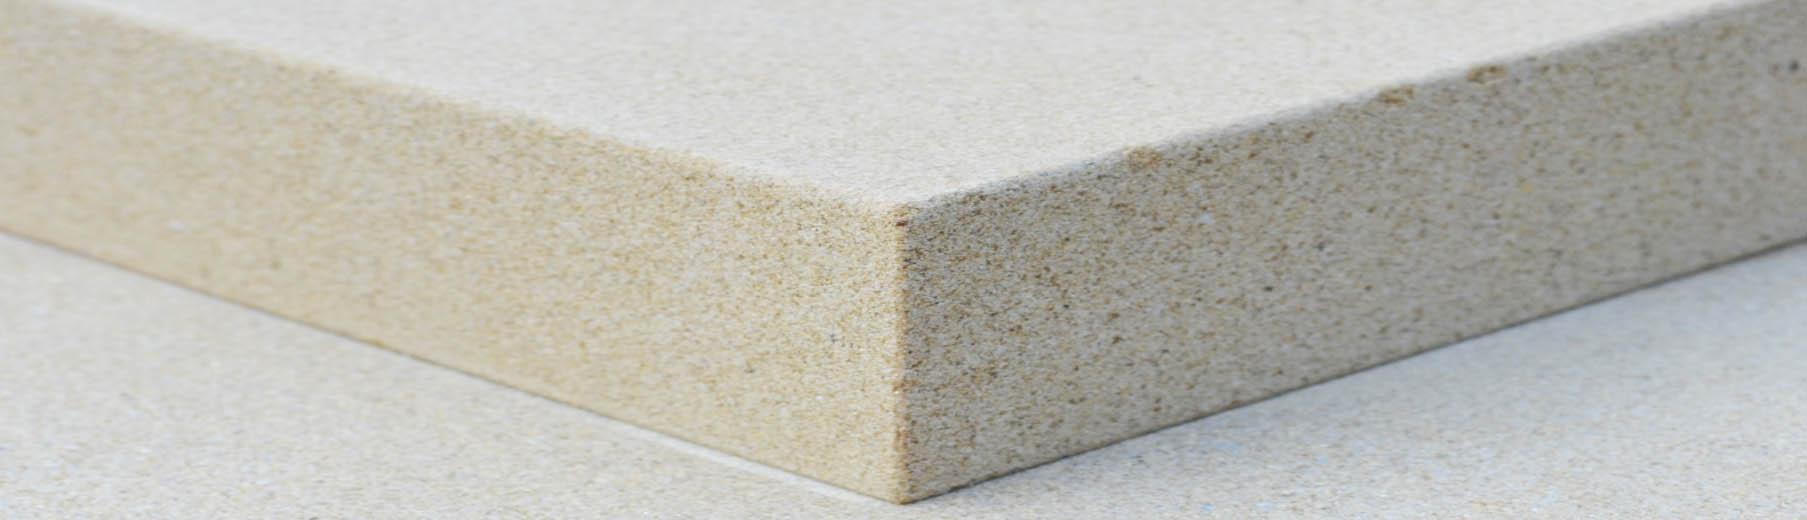 yorkstone-flooring-4